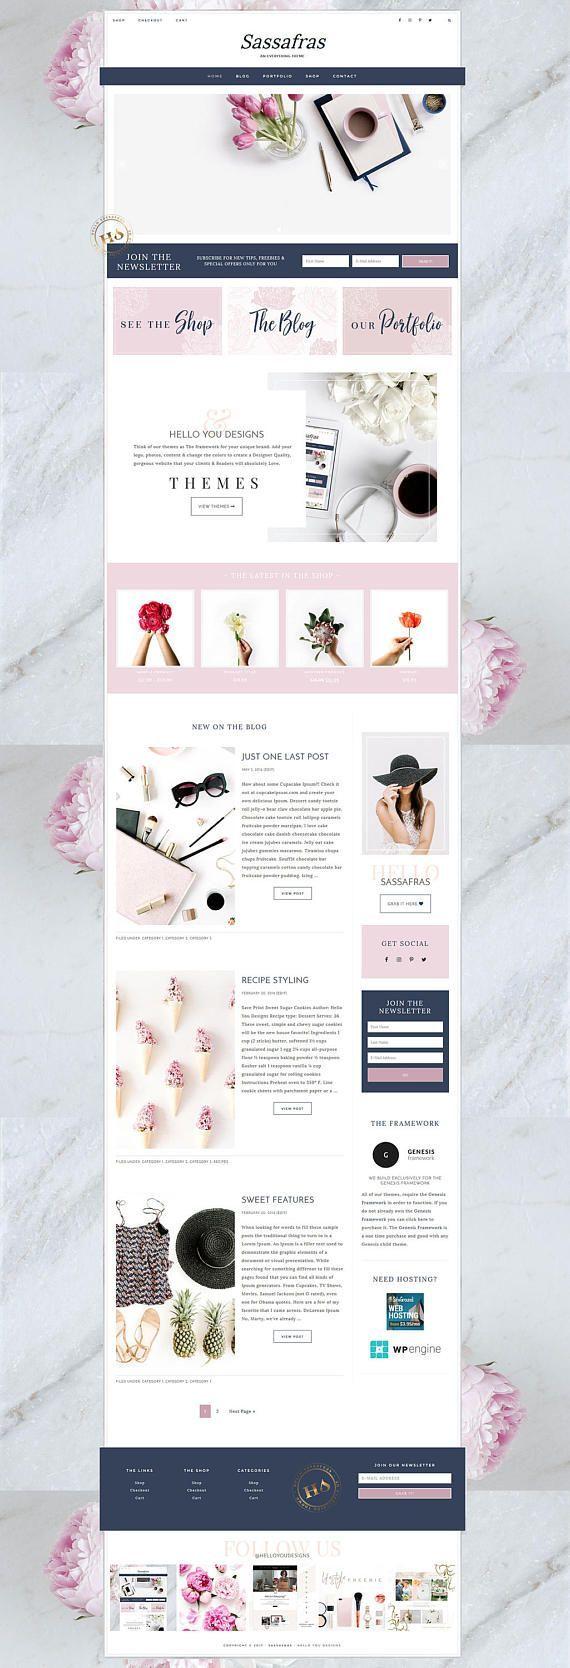 SALE Feminine Wordpress Theme for Creative Entrepreneurs